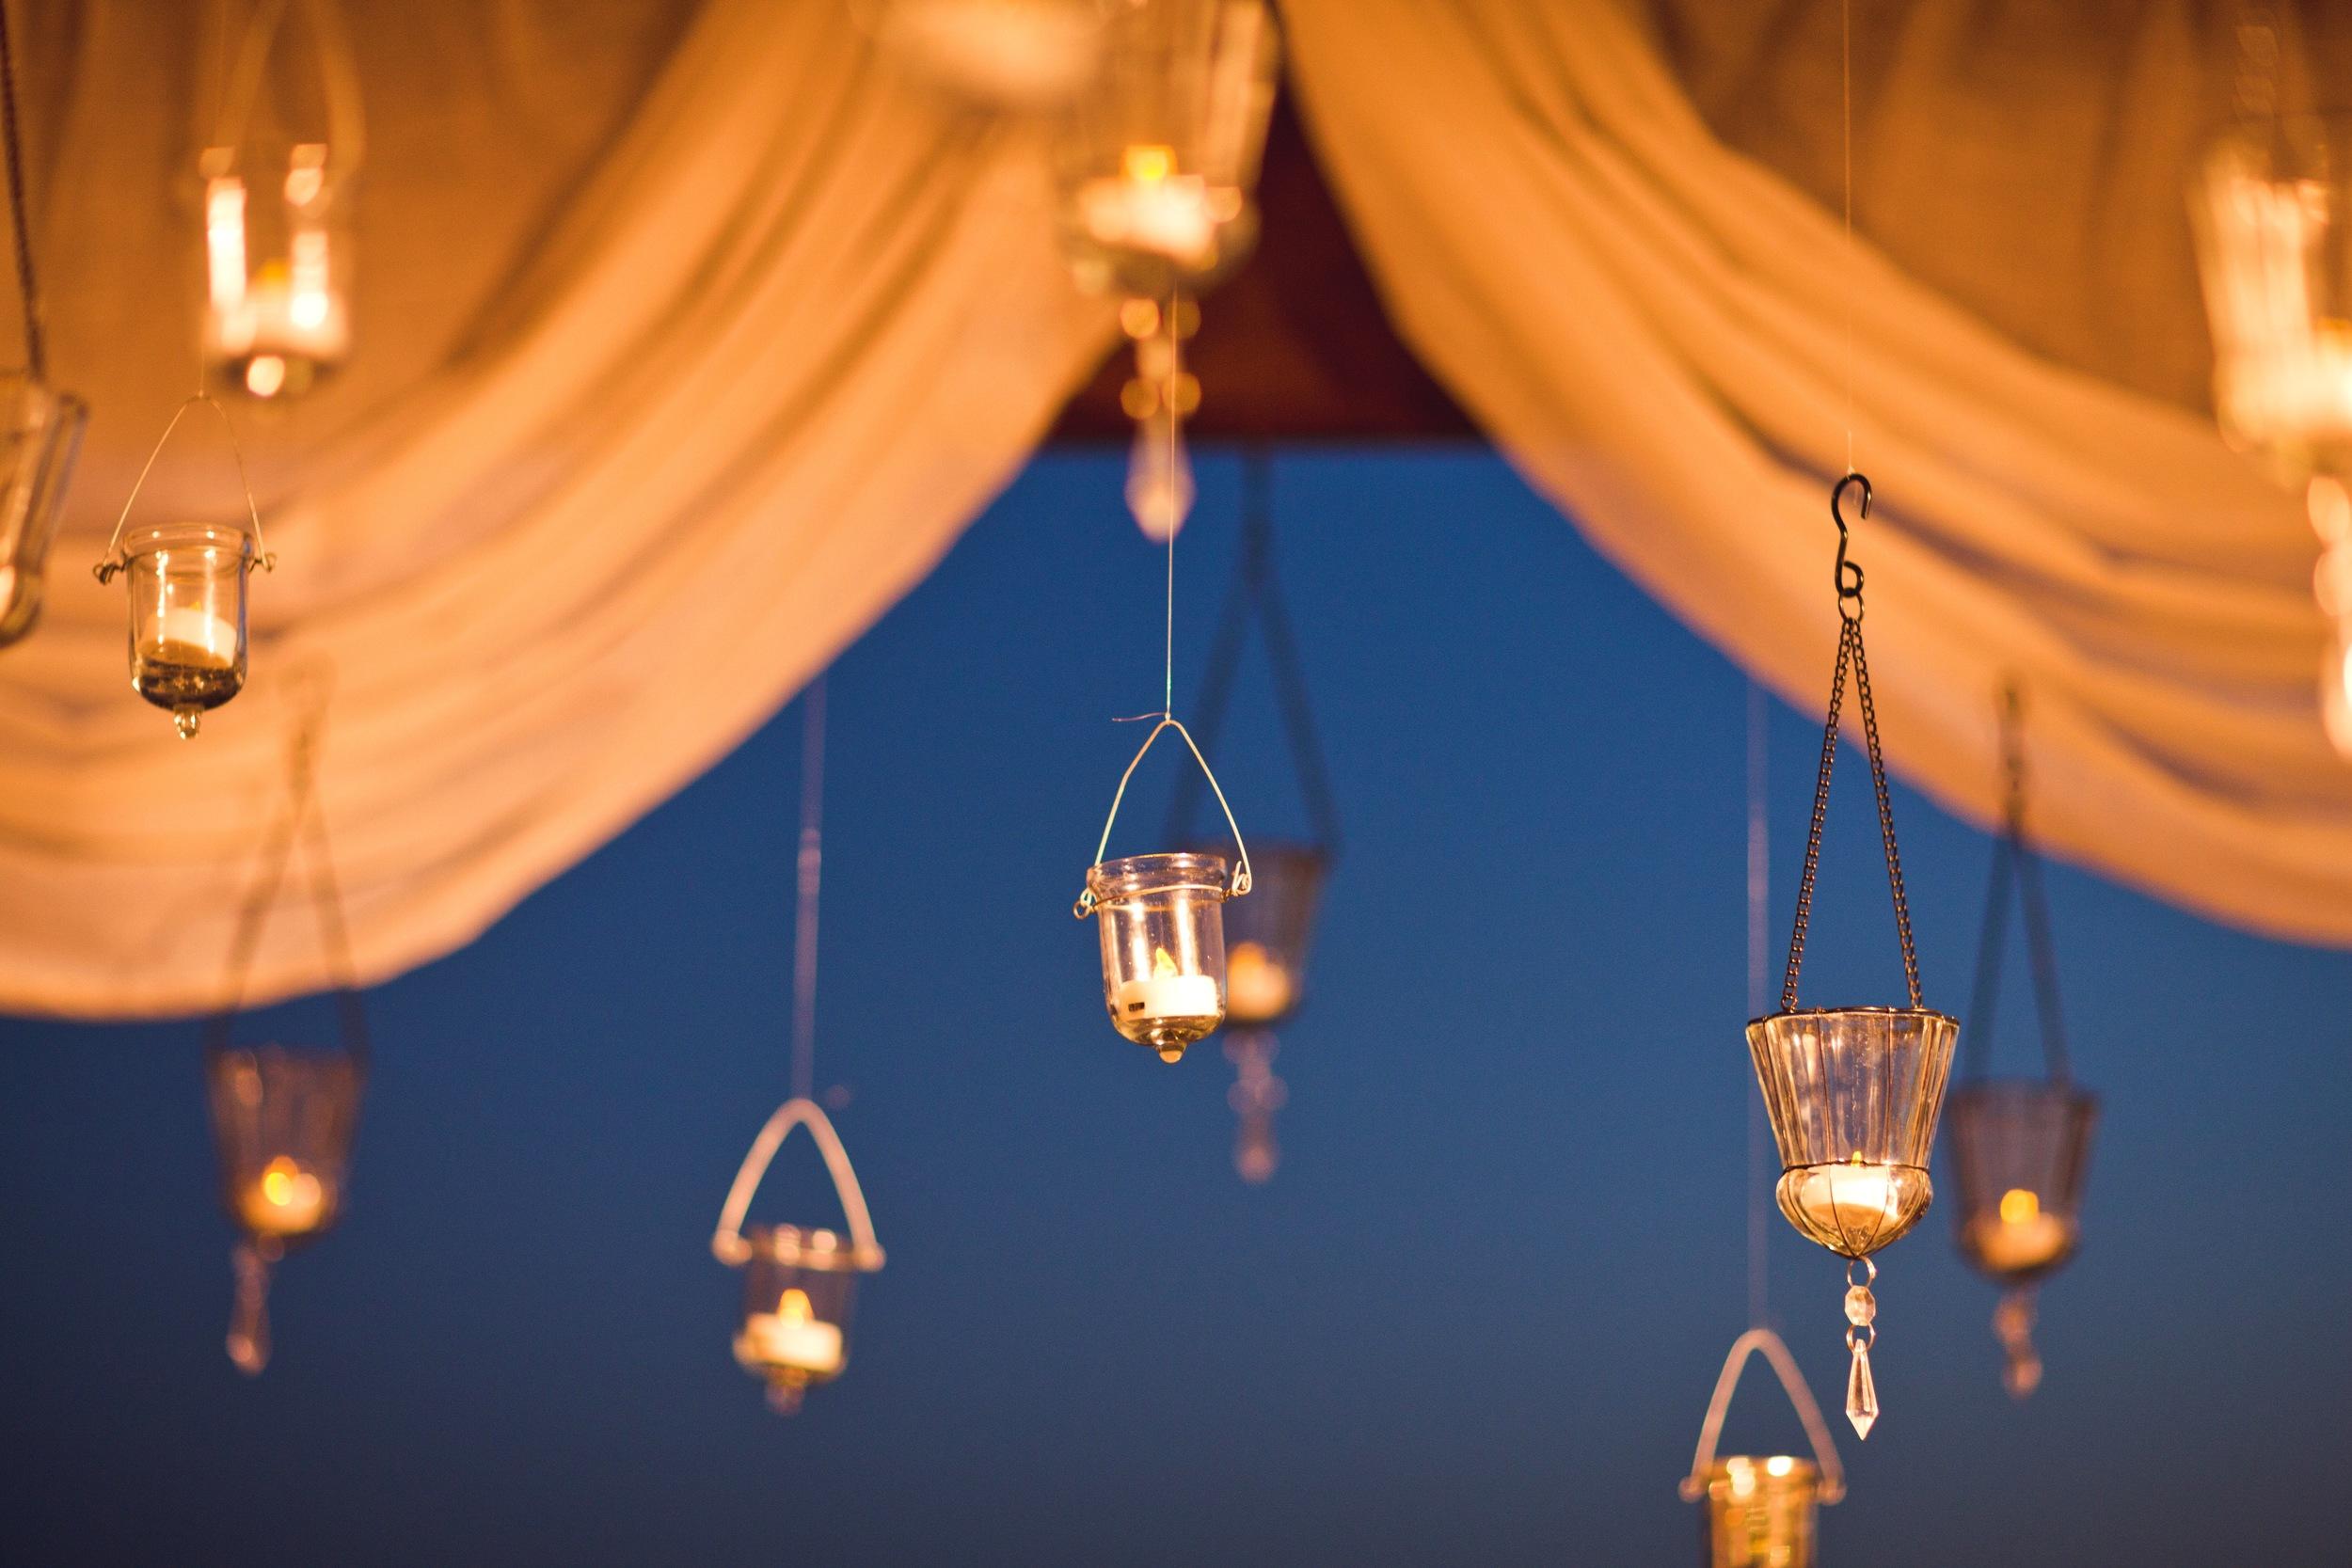 hanging candles at dusk.jpg